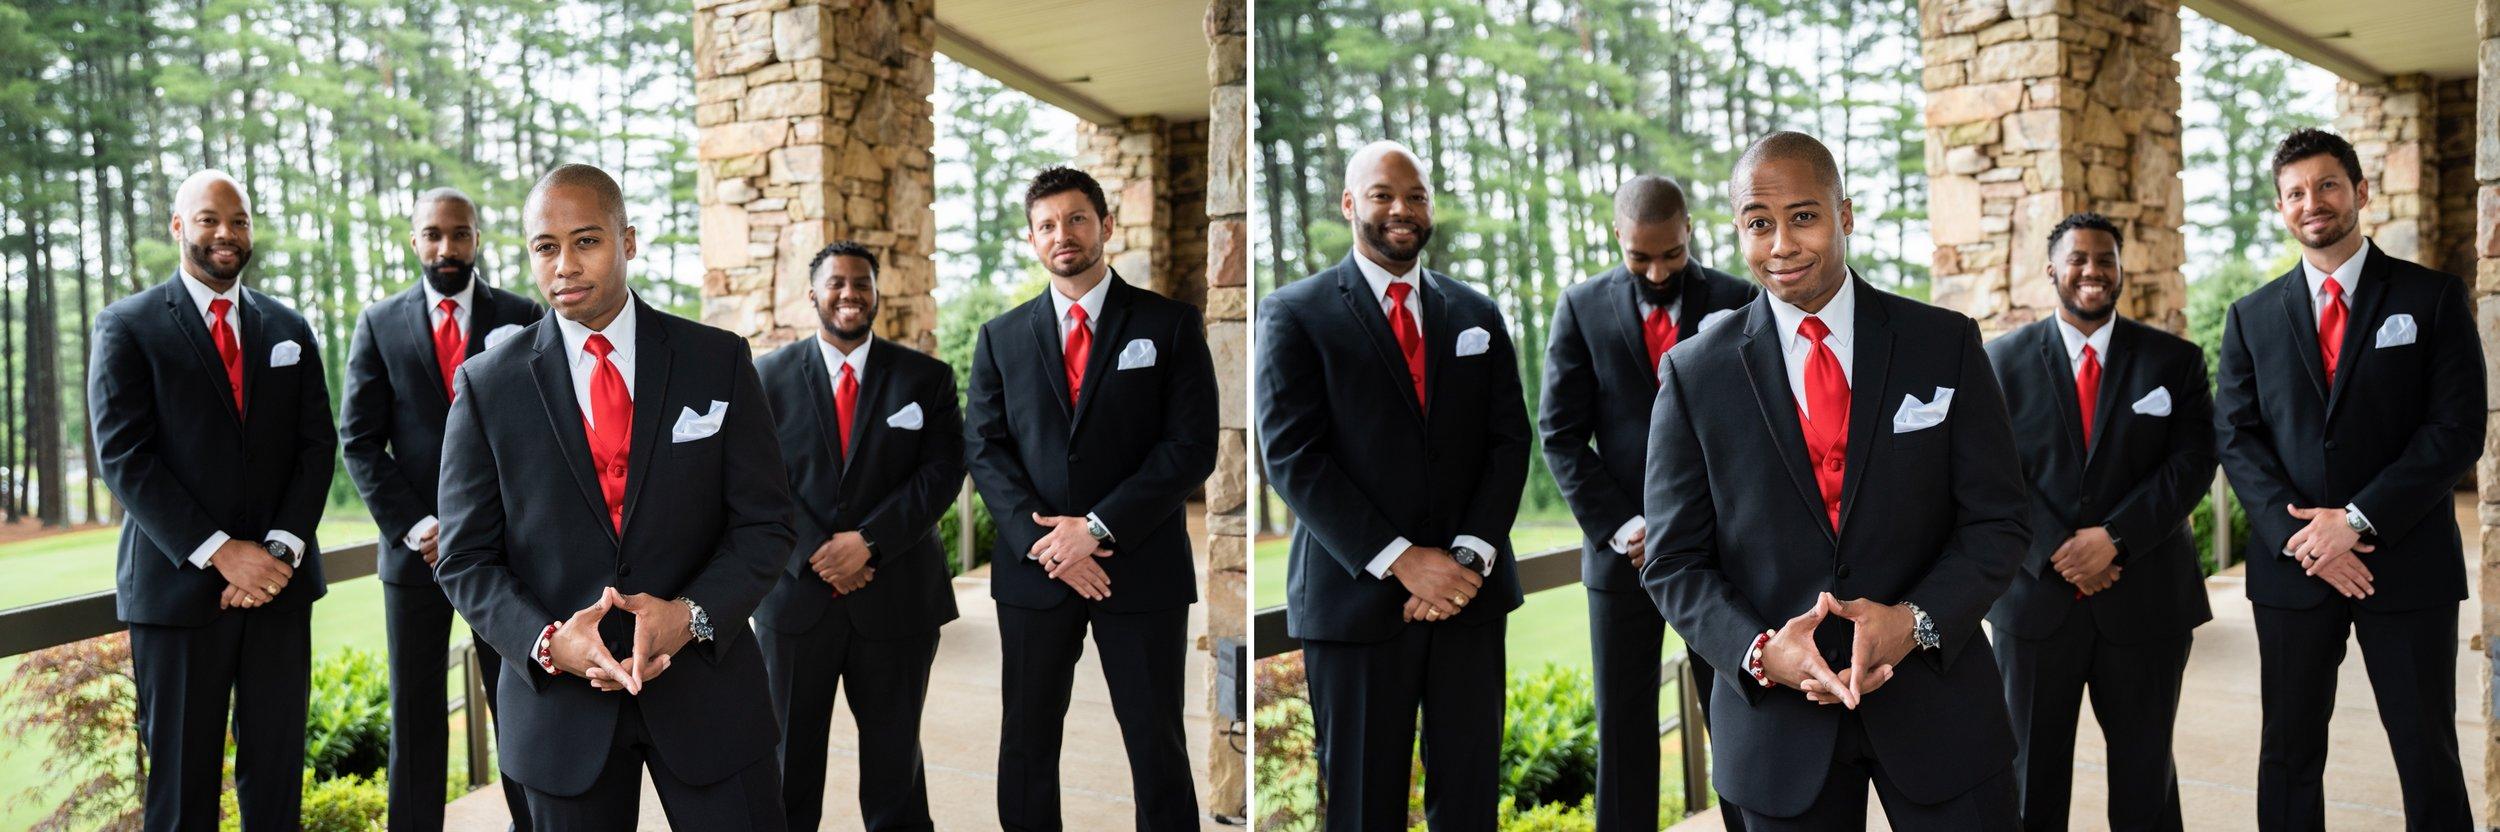 High Vista Wedding - Asheville Vendors  43.jpg